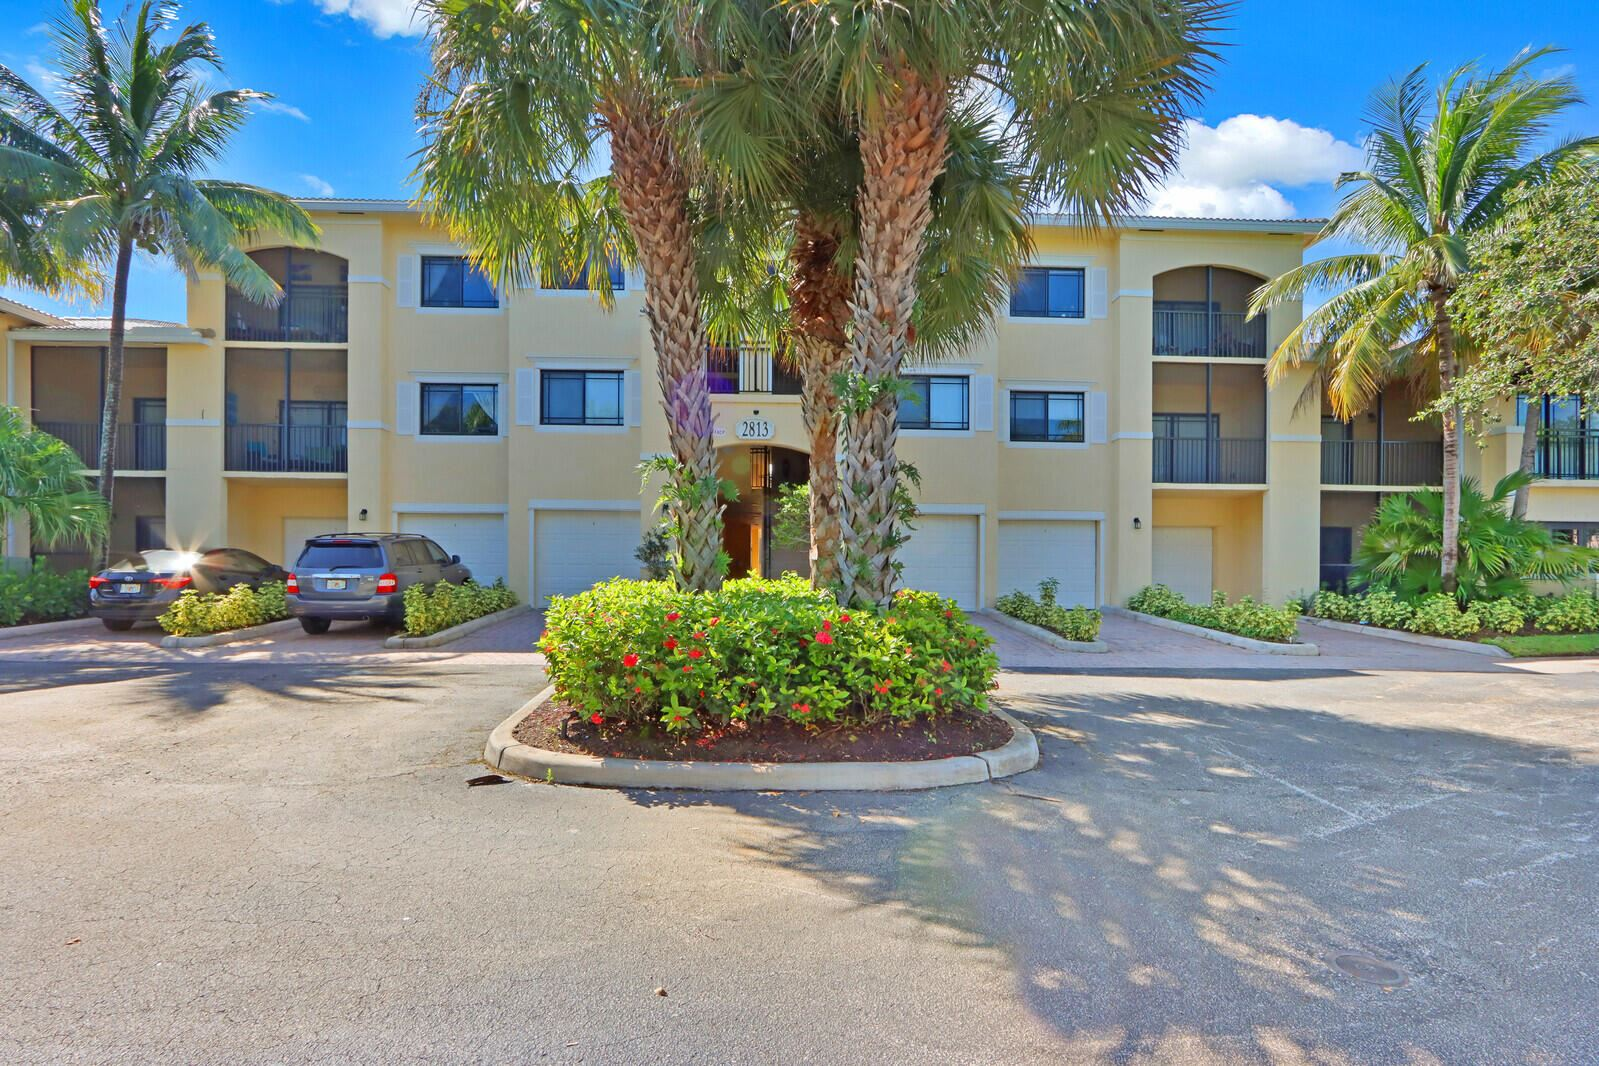 Photo for 2813 Grande Parkway #202, Palm Beach Gardens, FL 33410 (MLS # RX-10750550)